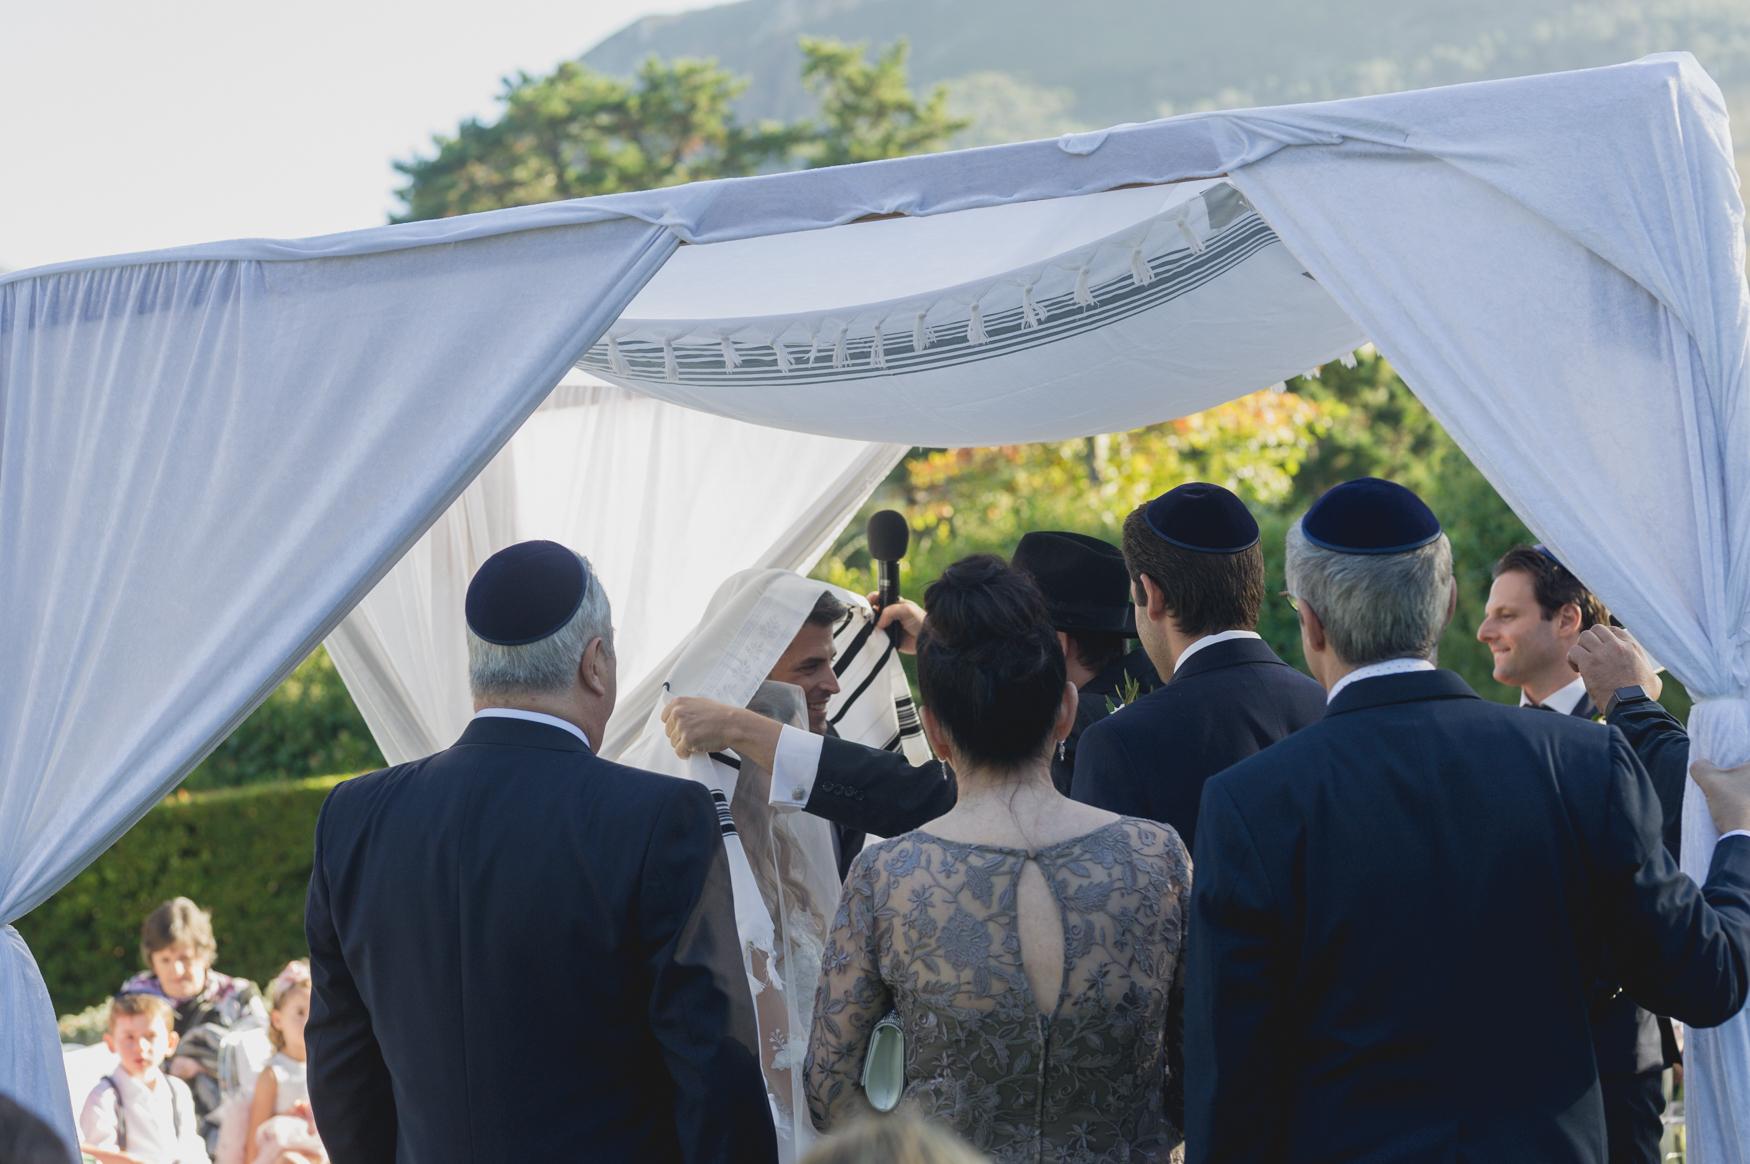 Leon_&_Martine's_Wedding_Photographs_17th_April_2019_@johnhenryweddingphoto_Low_Resolution_Web-279.JPG